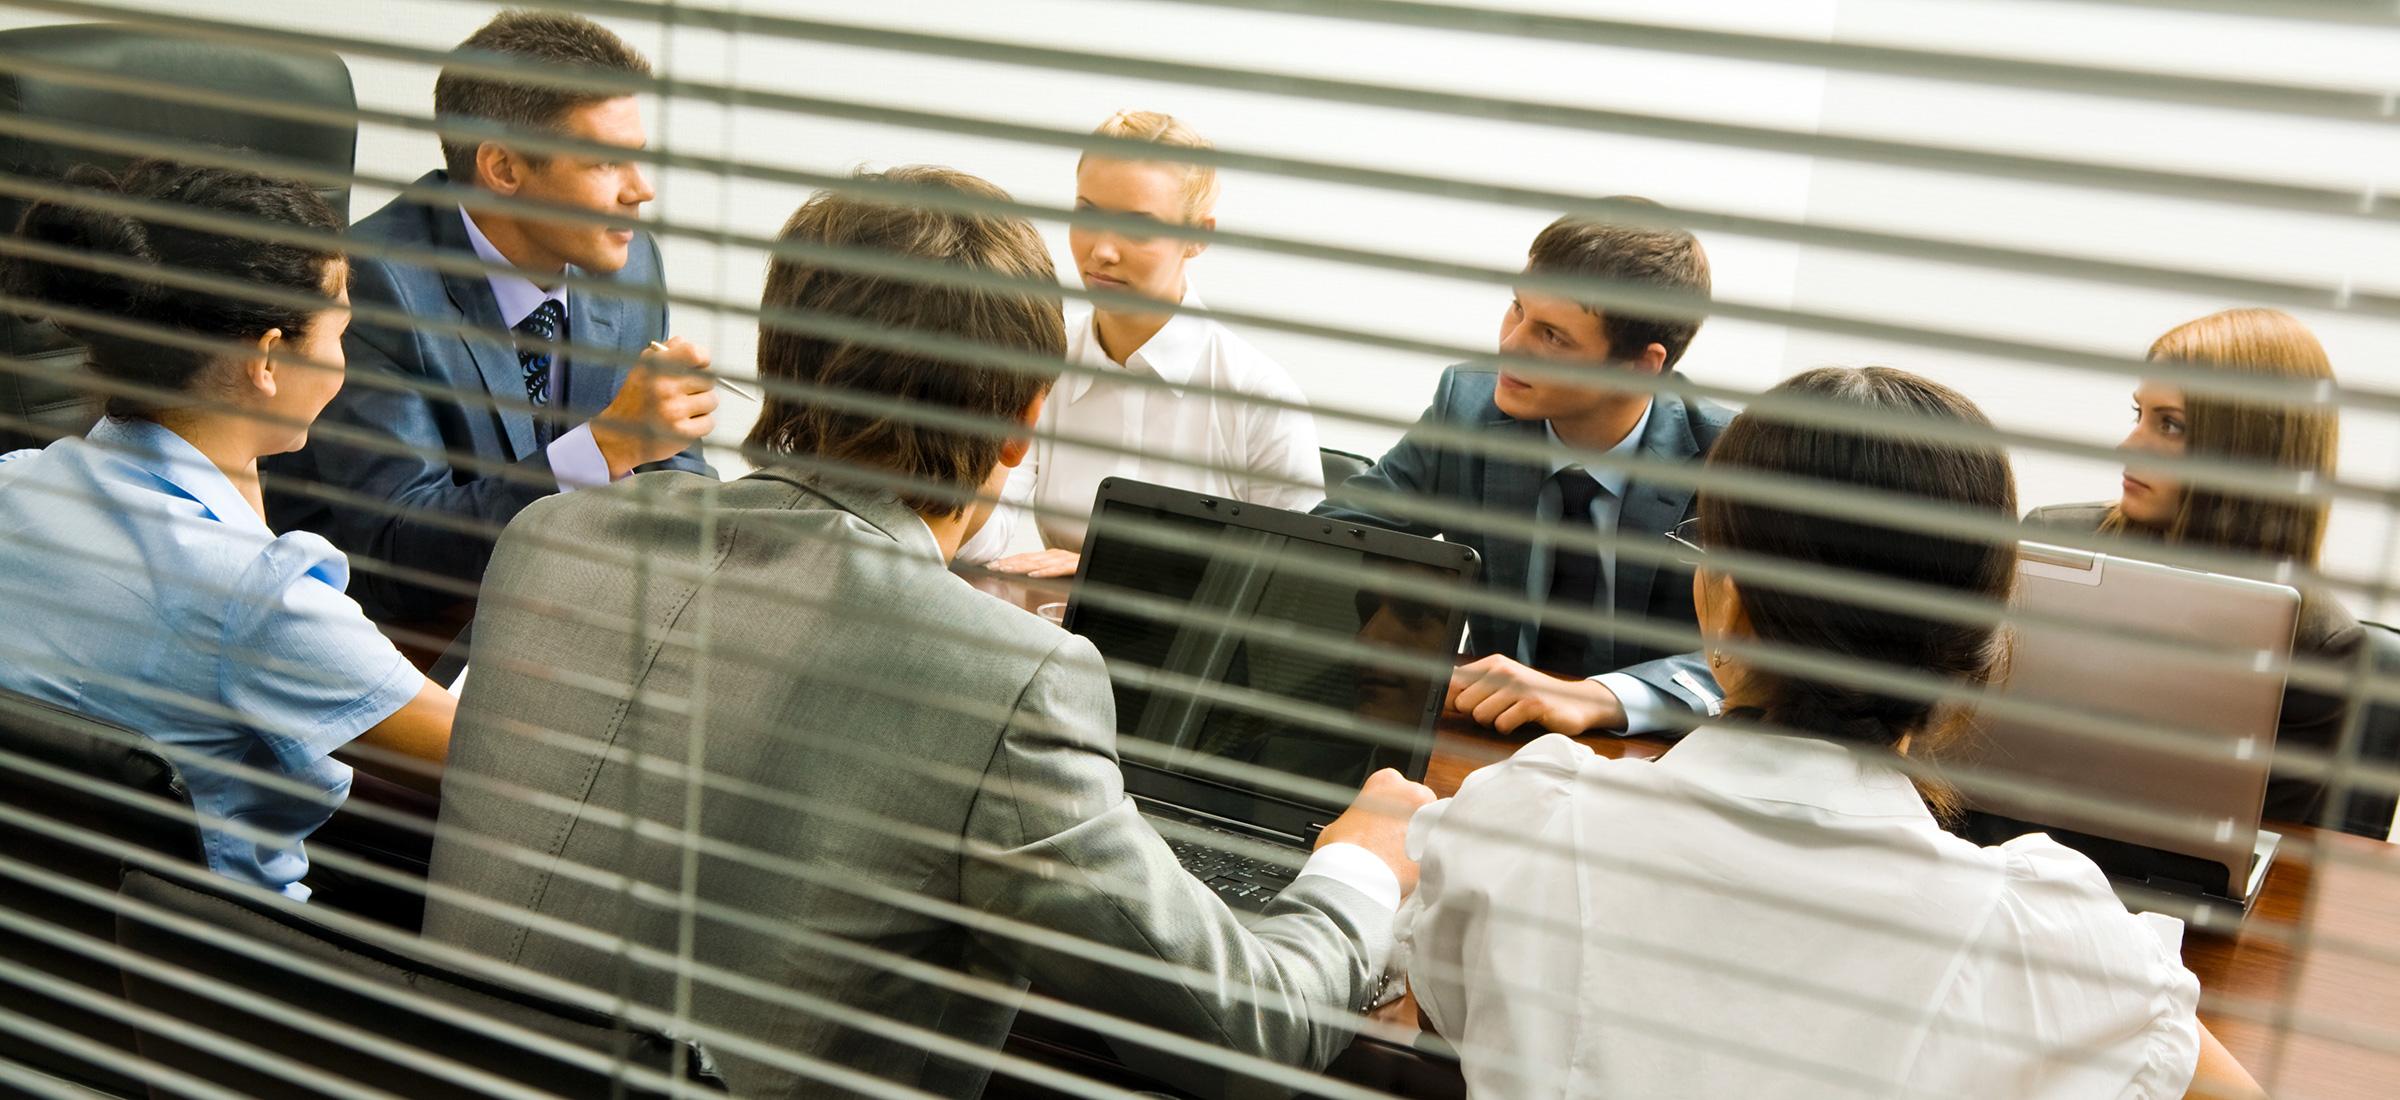 Nos missions sociales expert comptable paris 15 ngp expertise - Travailler en cabinet d expertise comptable ...